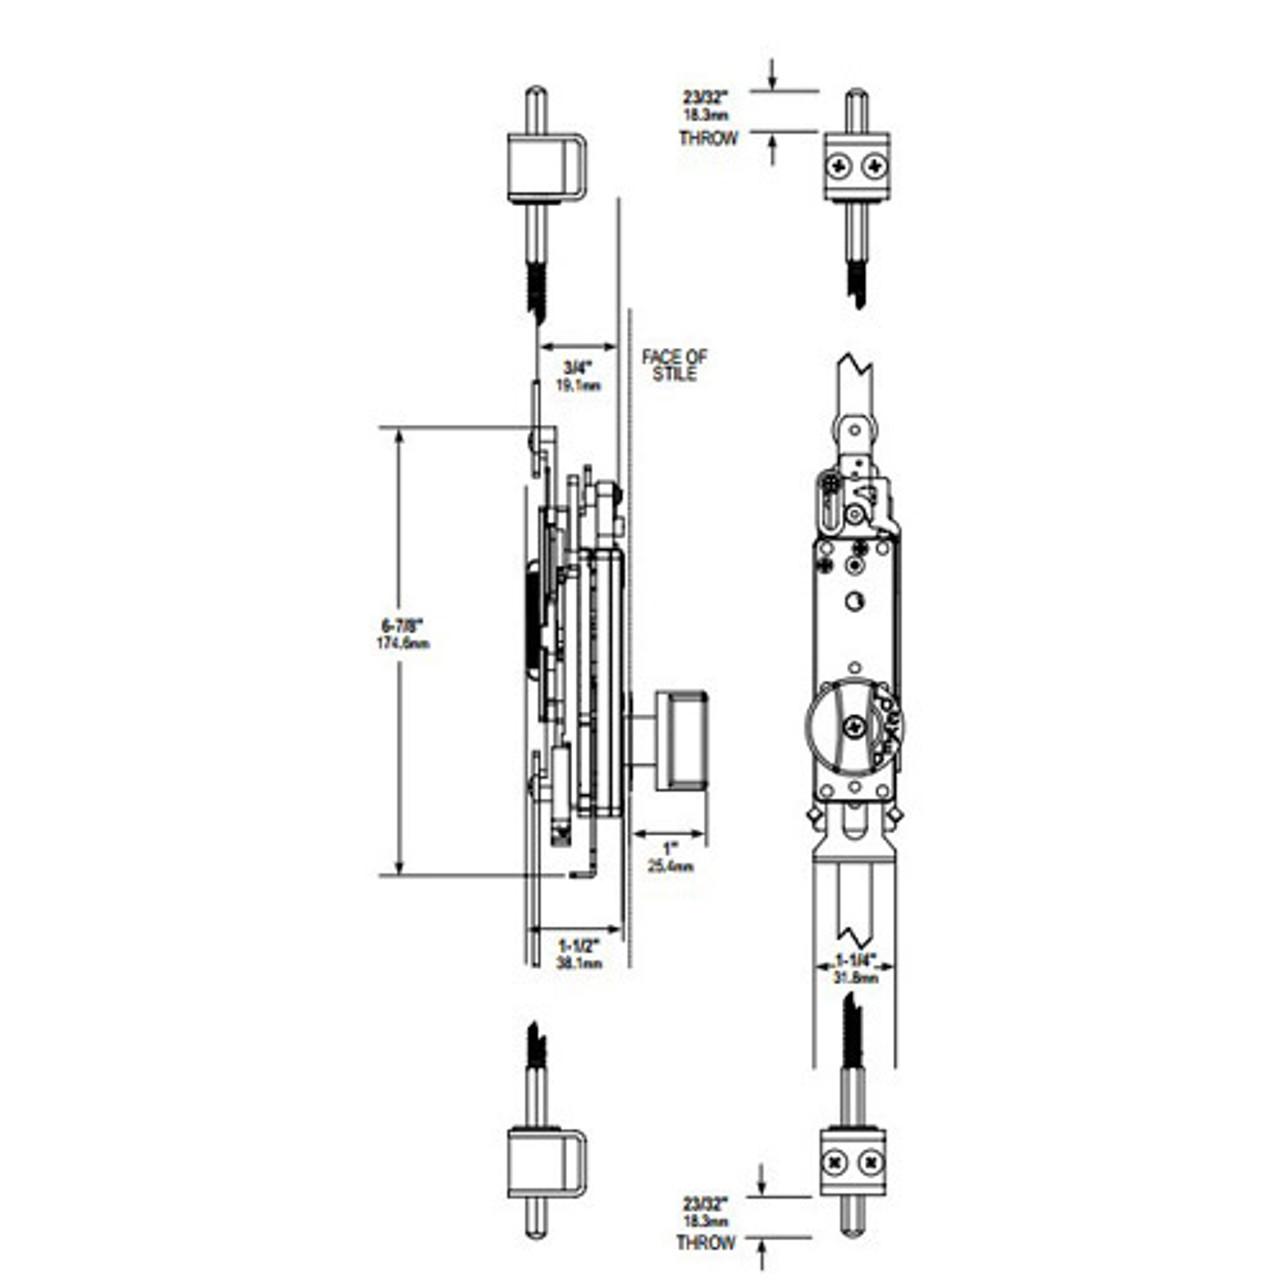 MS2182-09-119 Adams Rite Flushbolt Dimensional View